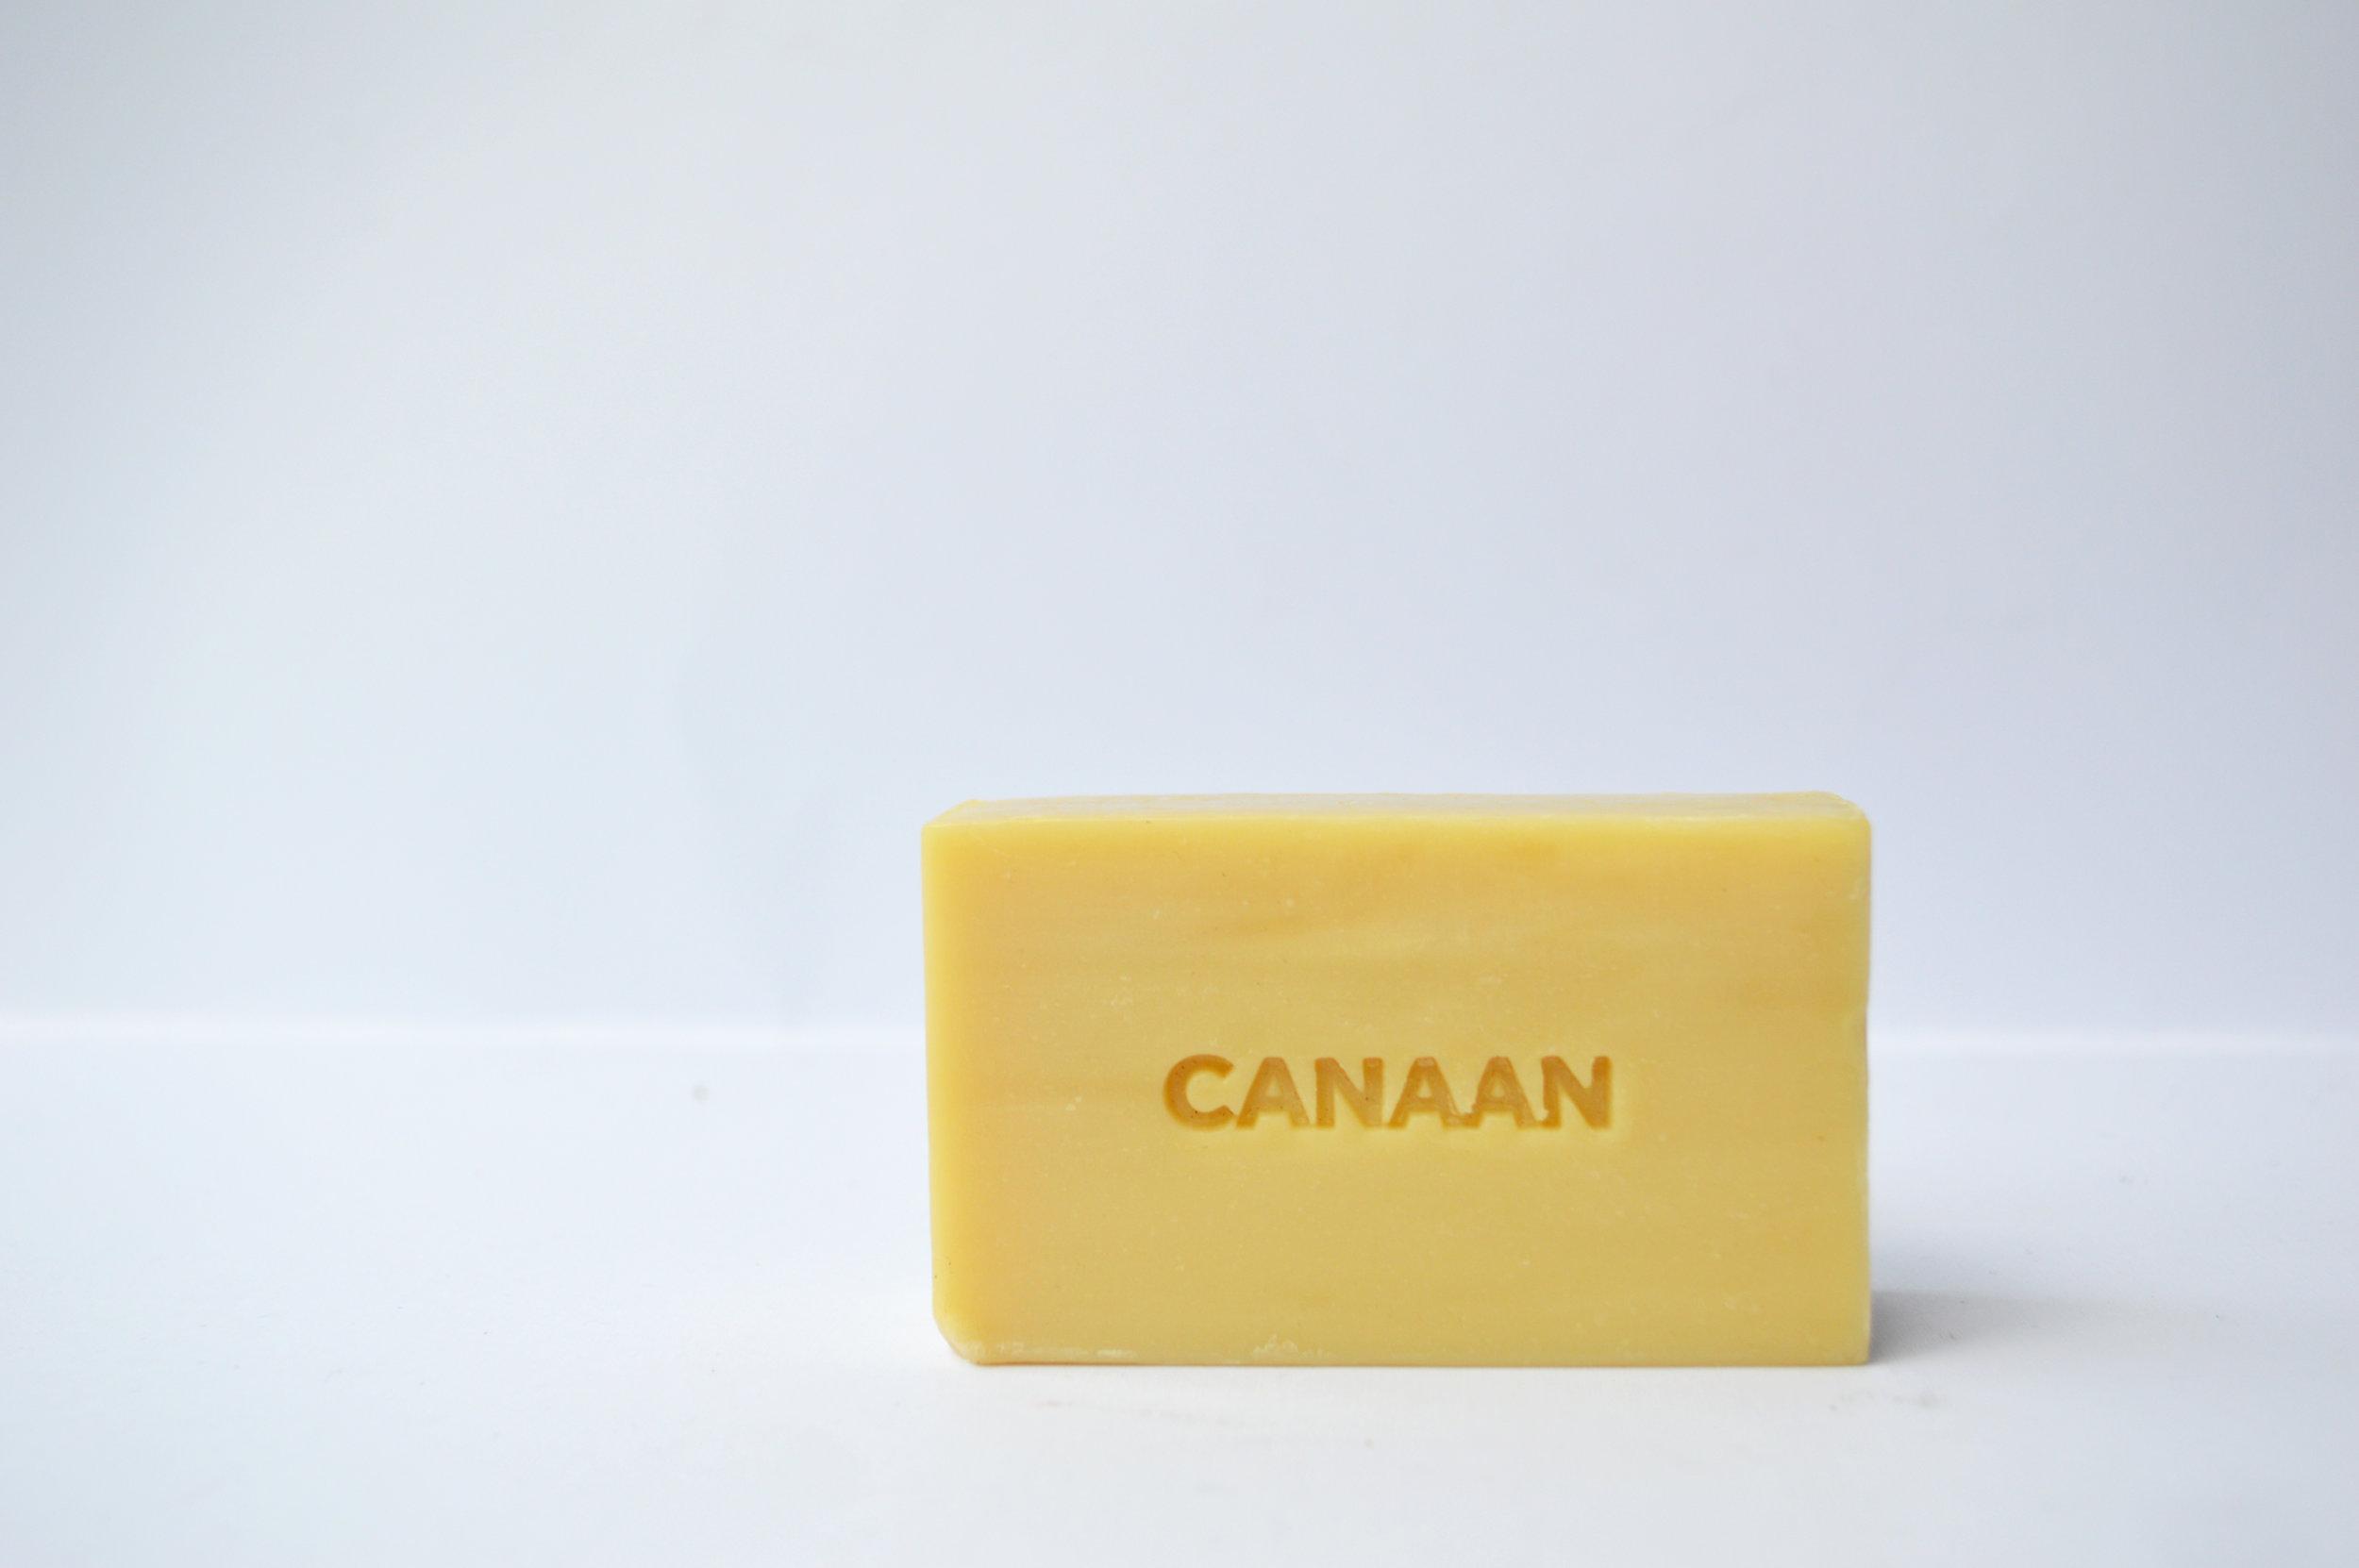 canaan soap bar 1.jpg